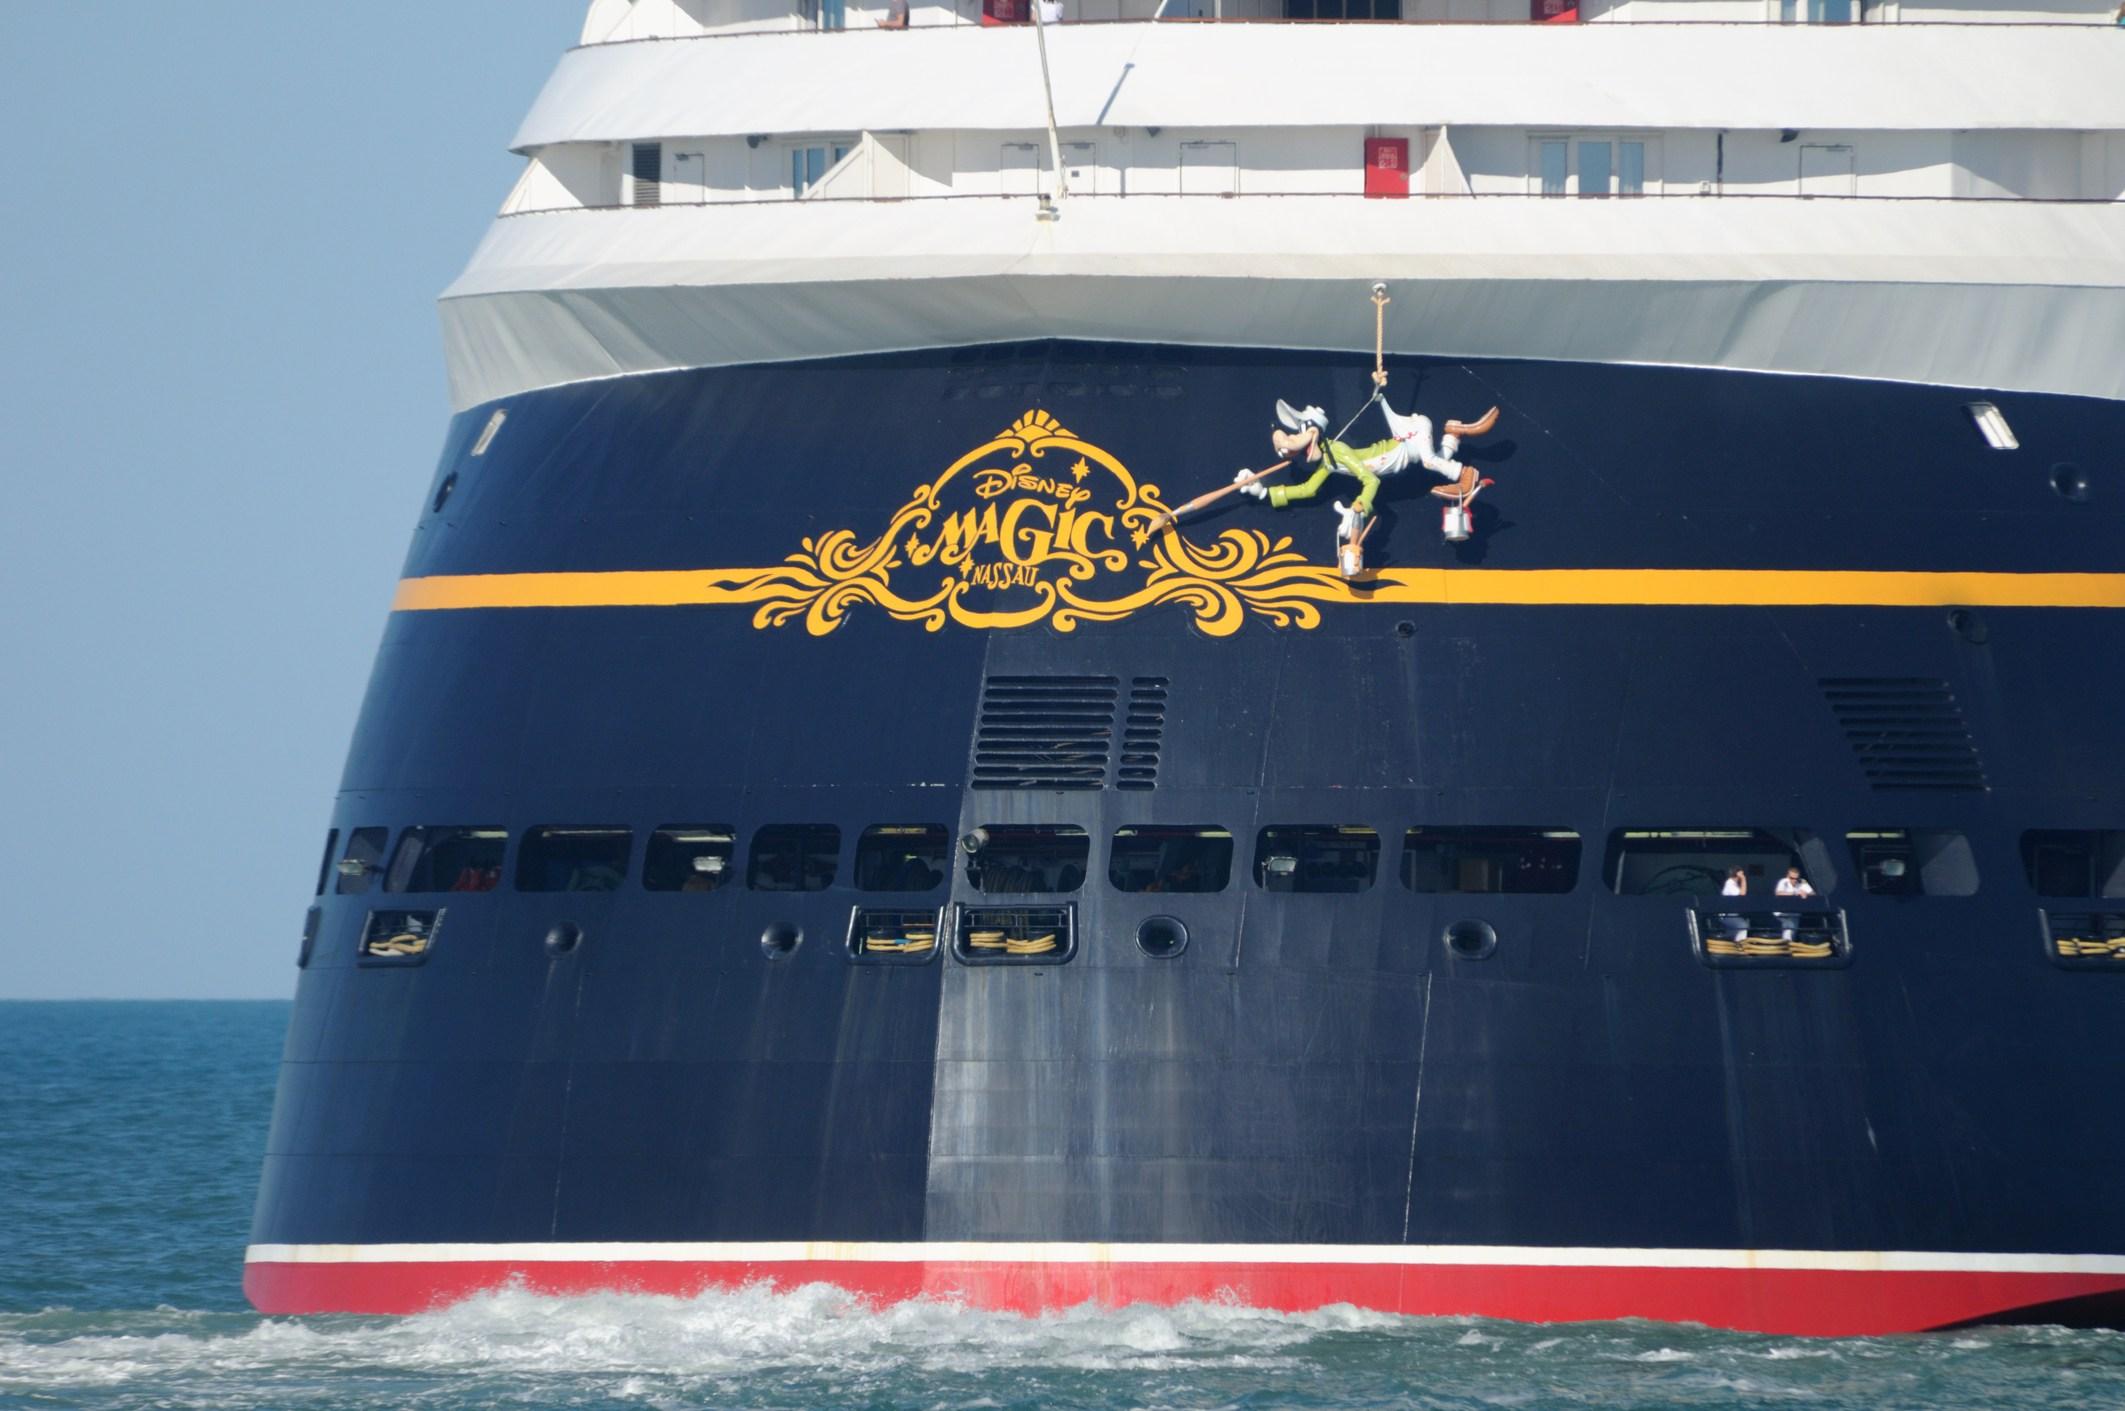 Disney Magic Cruise ship